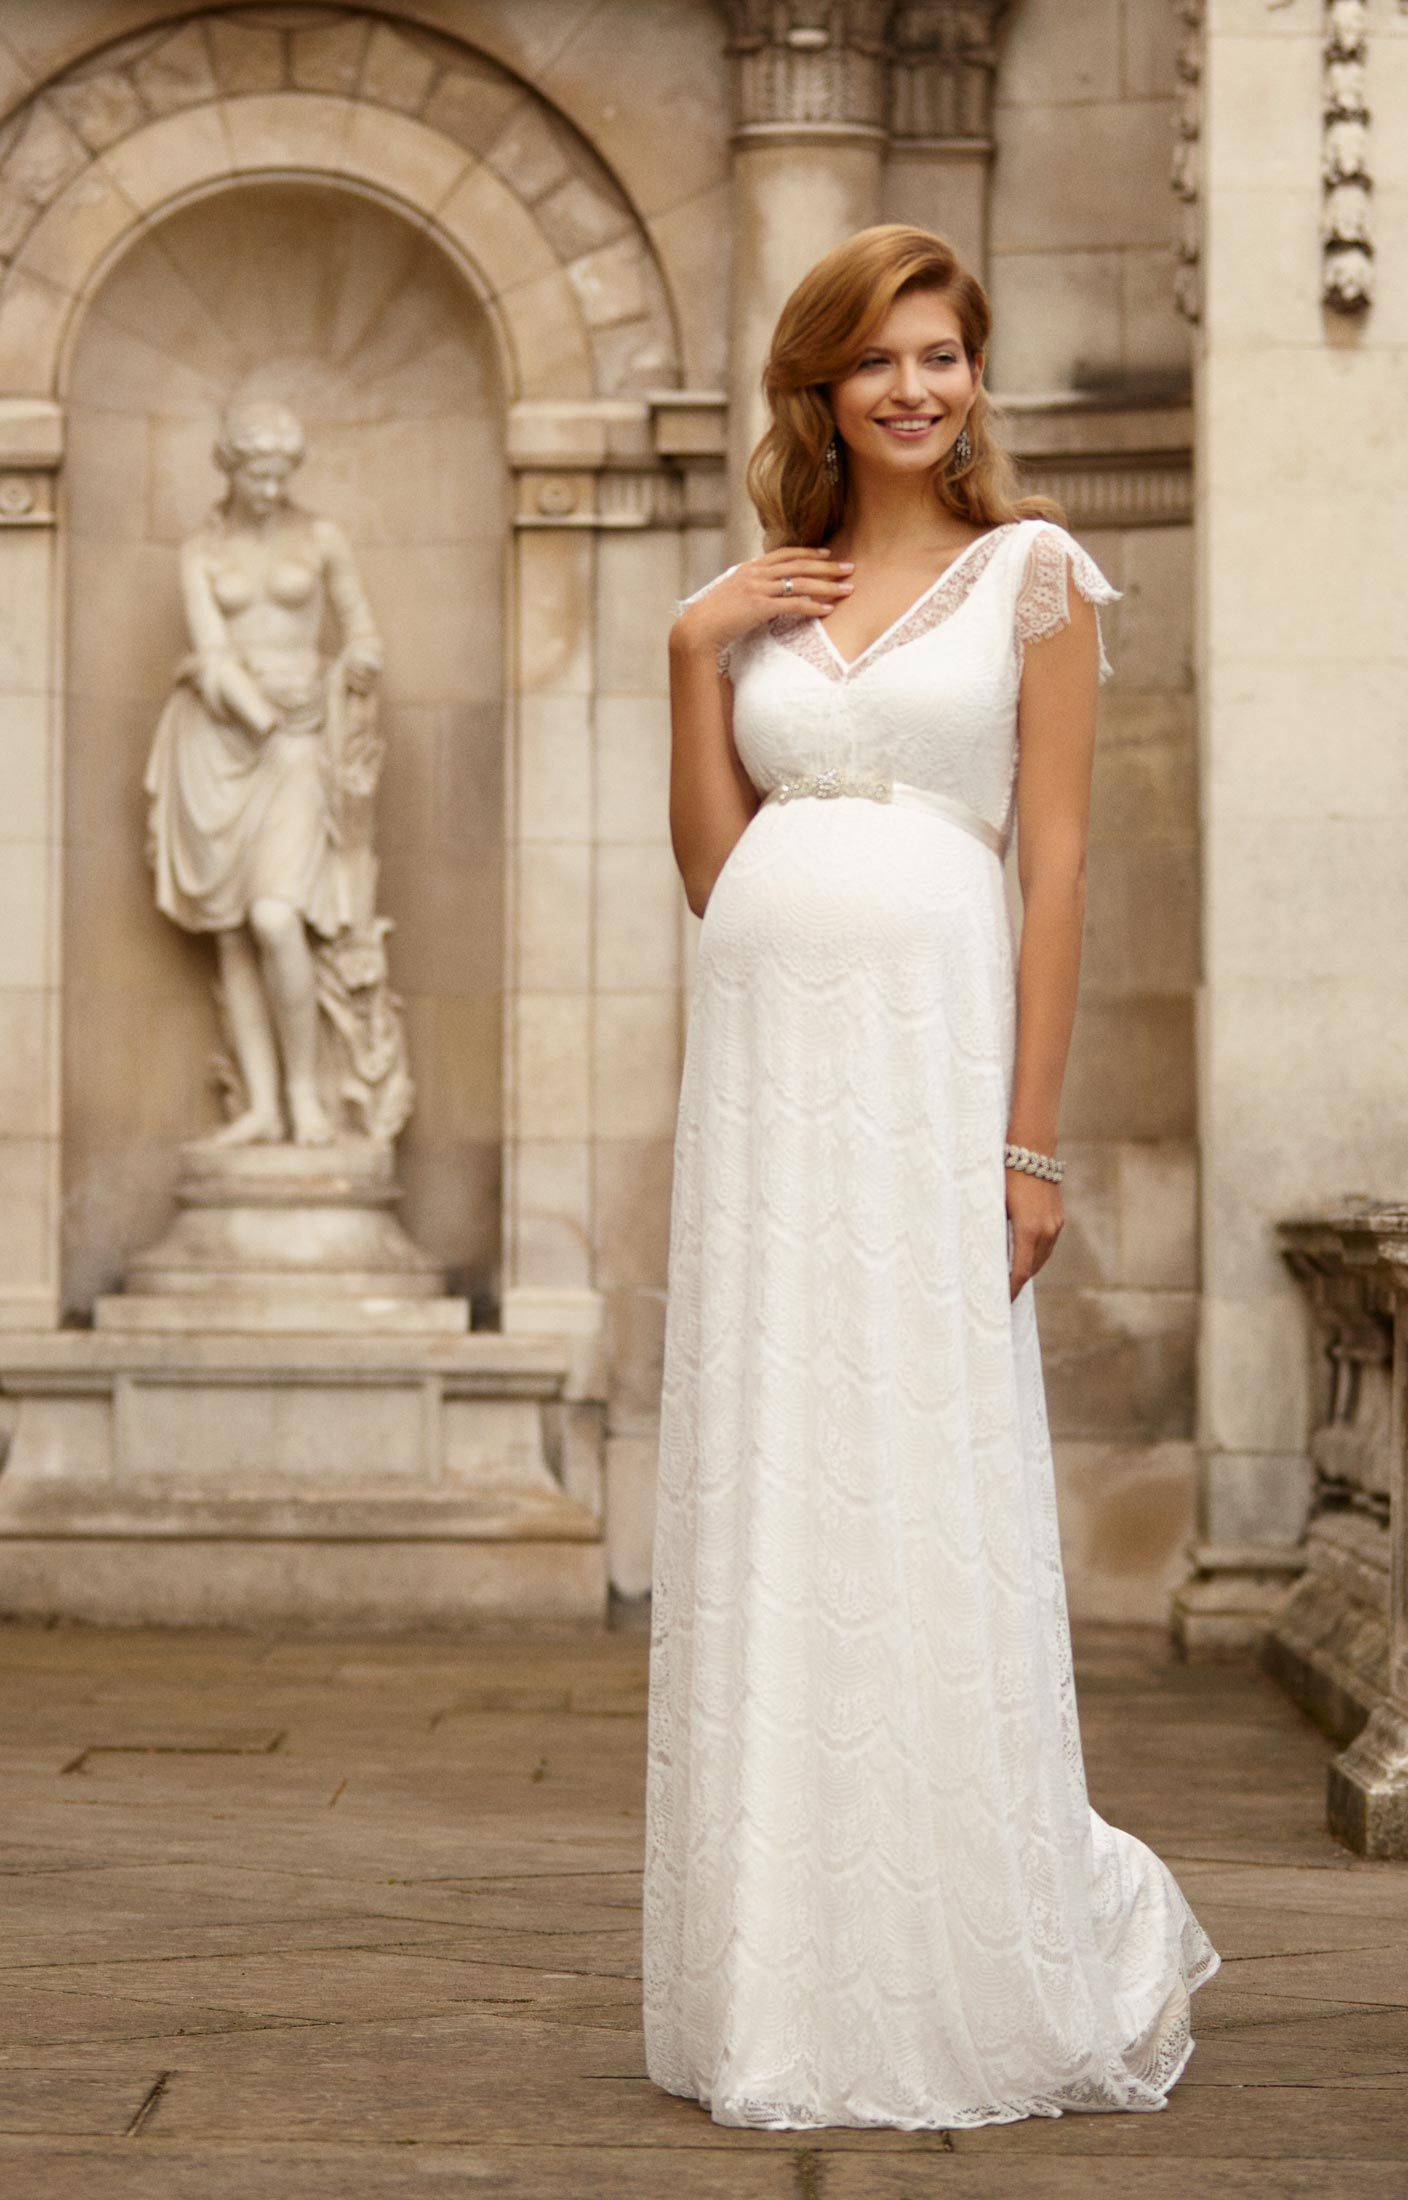 Gorgeous Maternity Wedding Dresses By Tiffany Rose